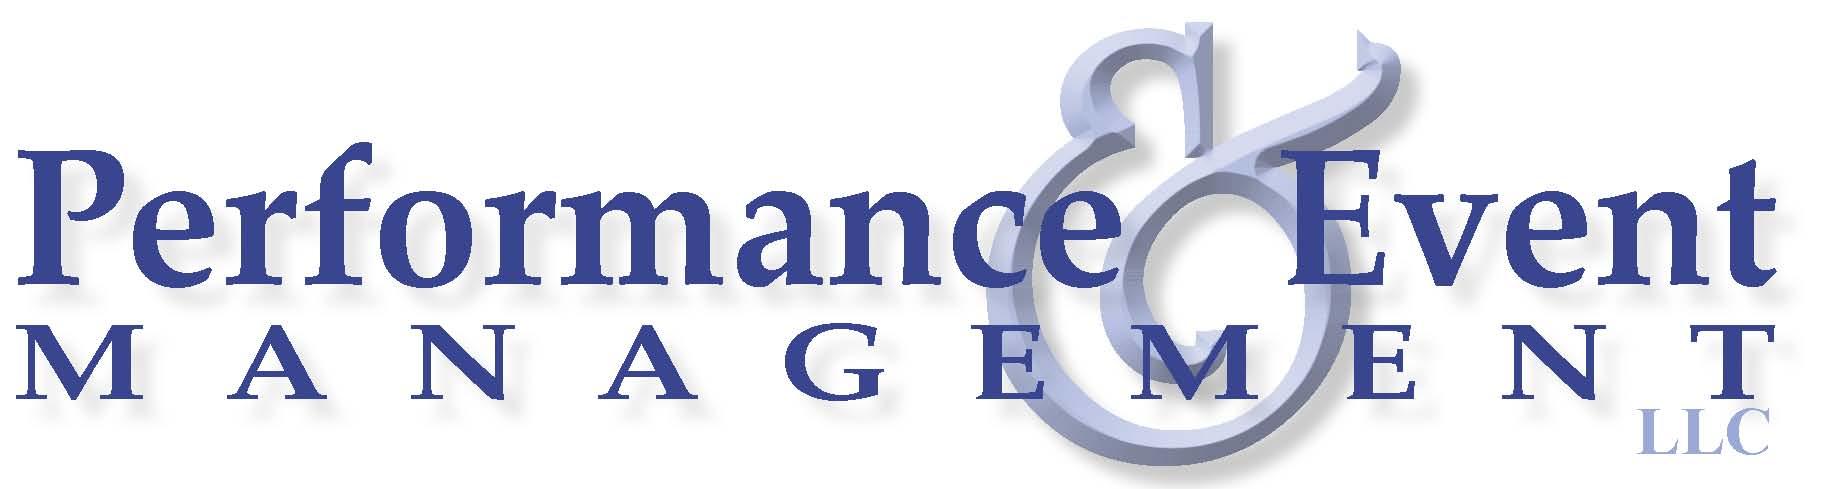 Performance & Event Management, LLC